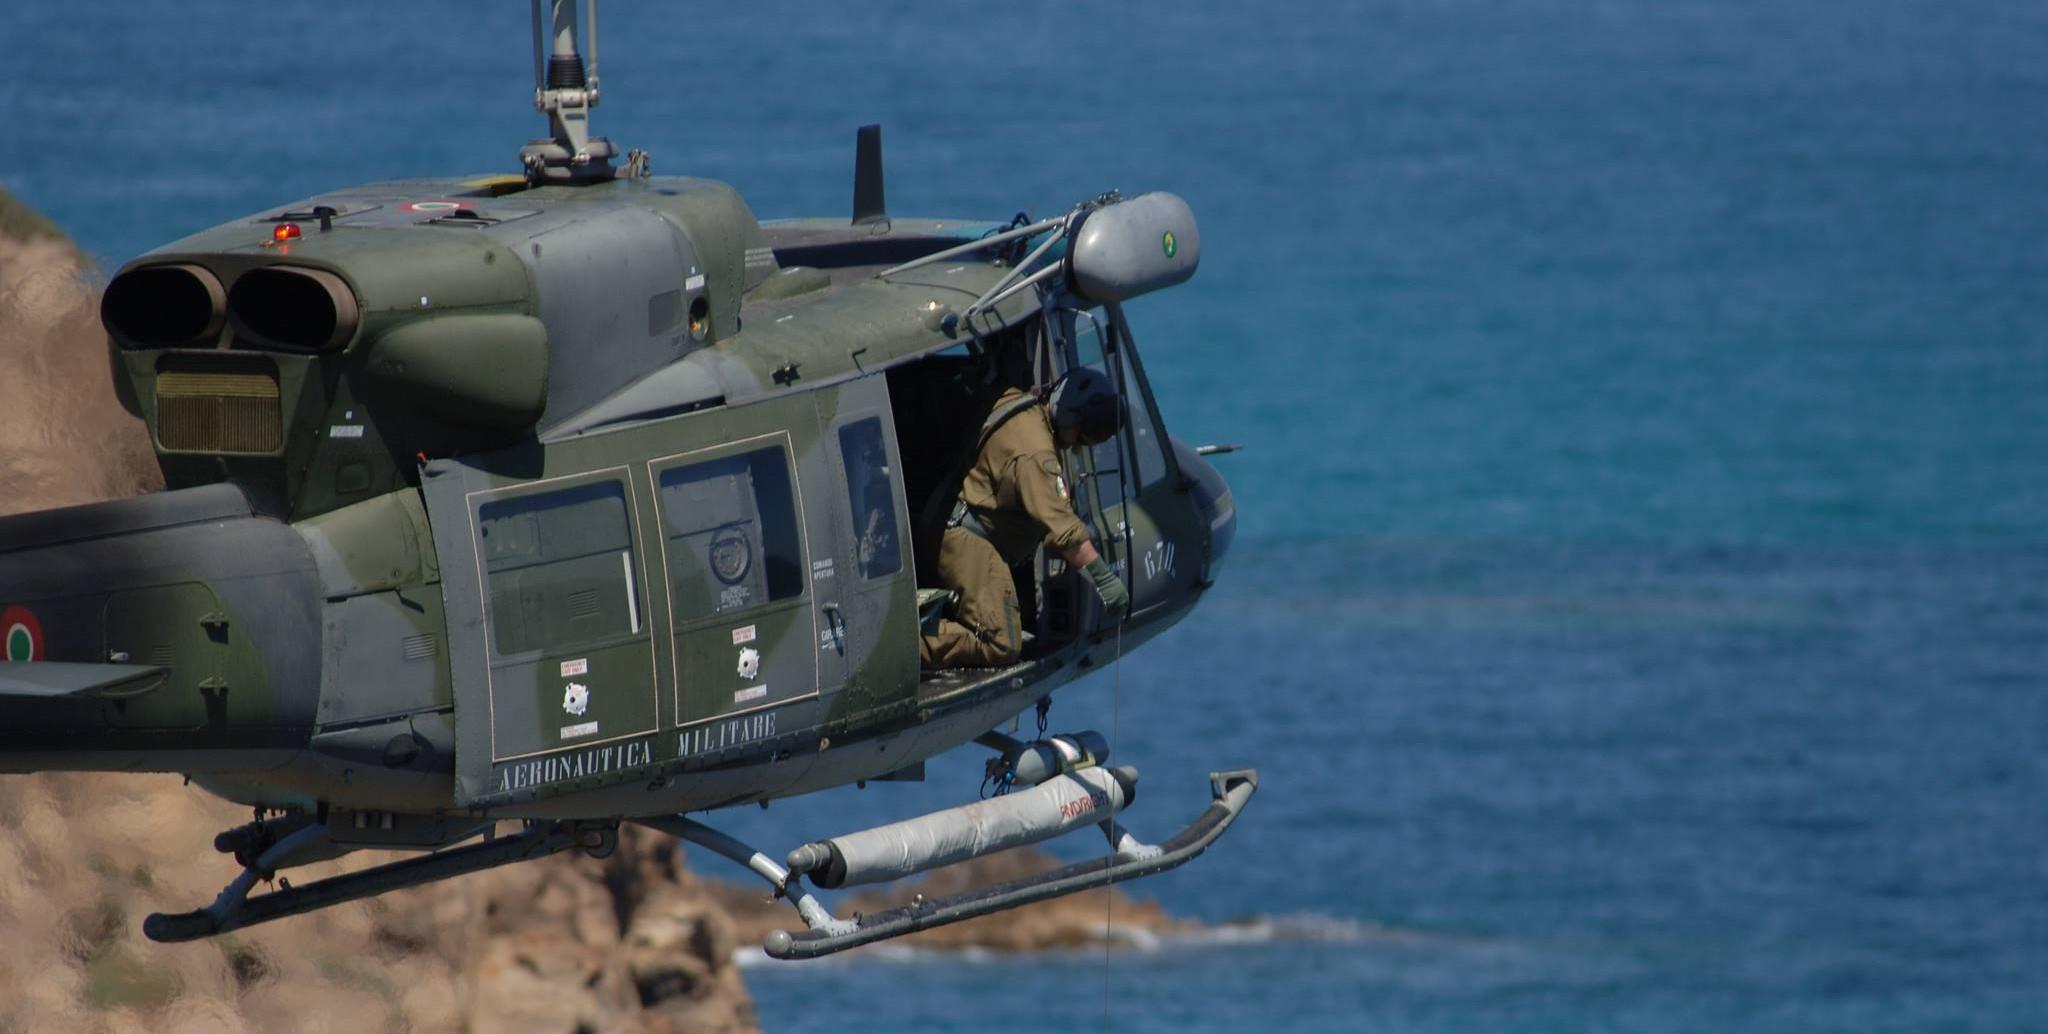 Elicottero Elisoccorso Sardegna : Elisoccorso in sardegna elmas sarà rimpiazzata da